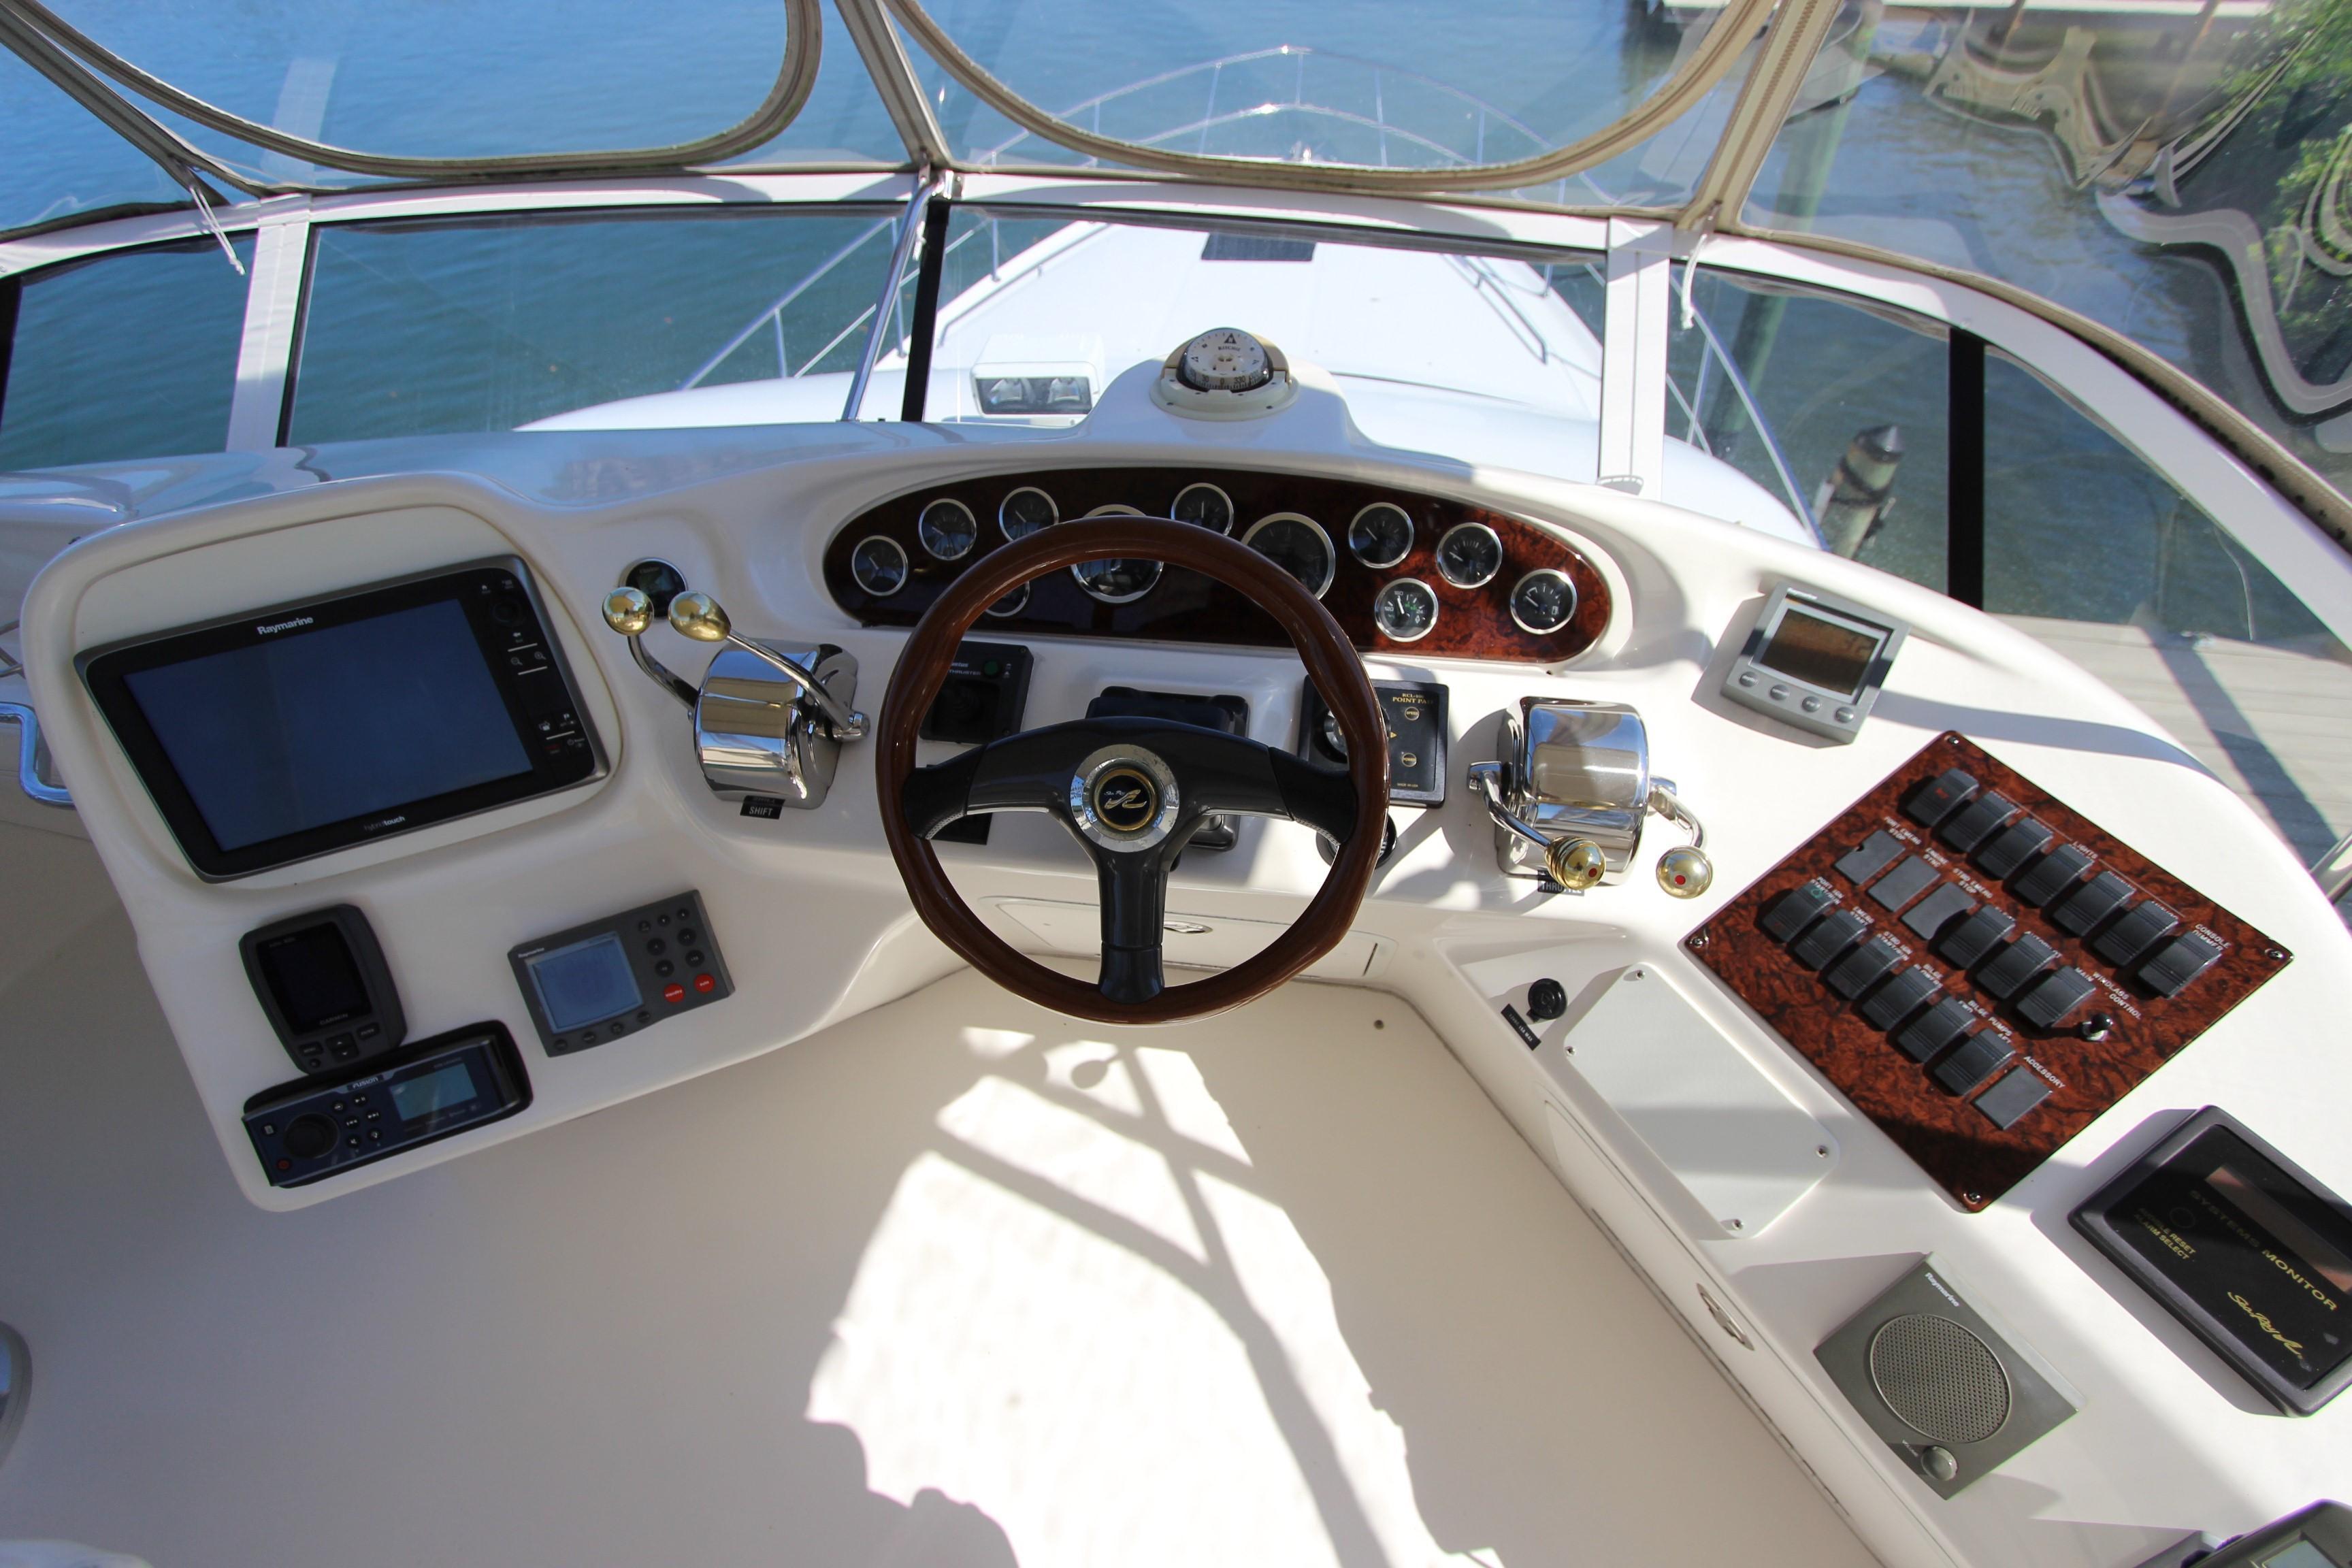 6338999_20170817104351924_1_XLARGE&w=924&h=693&t=1502995534000 2003 sea ray 400 sedan bridge power boat for sale www yachtworld com  at honlapkeszites.co